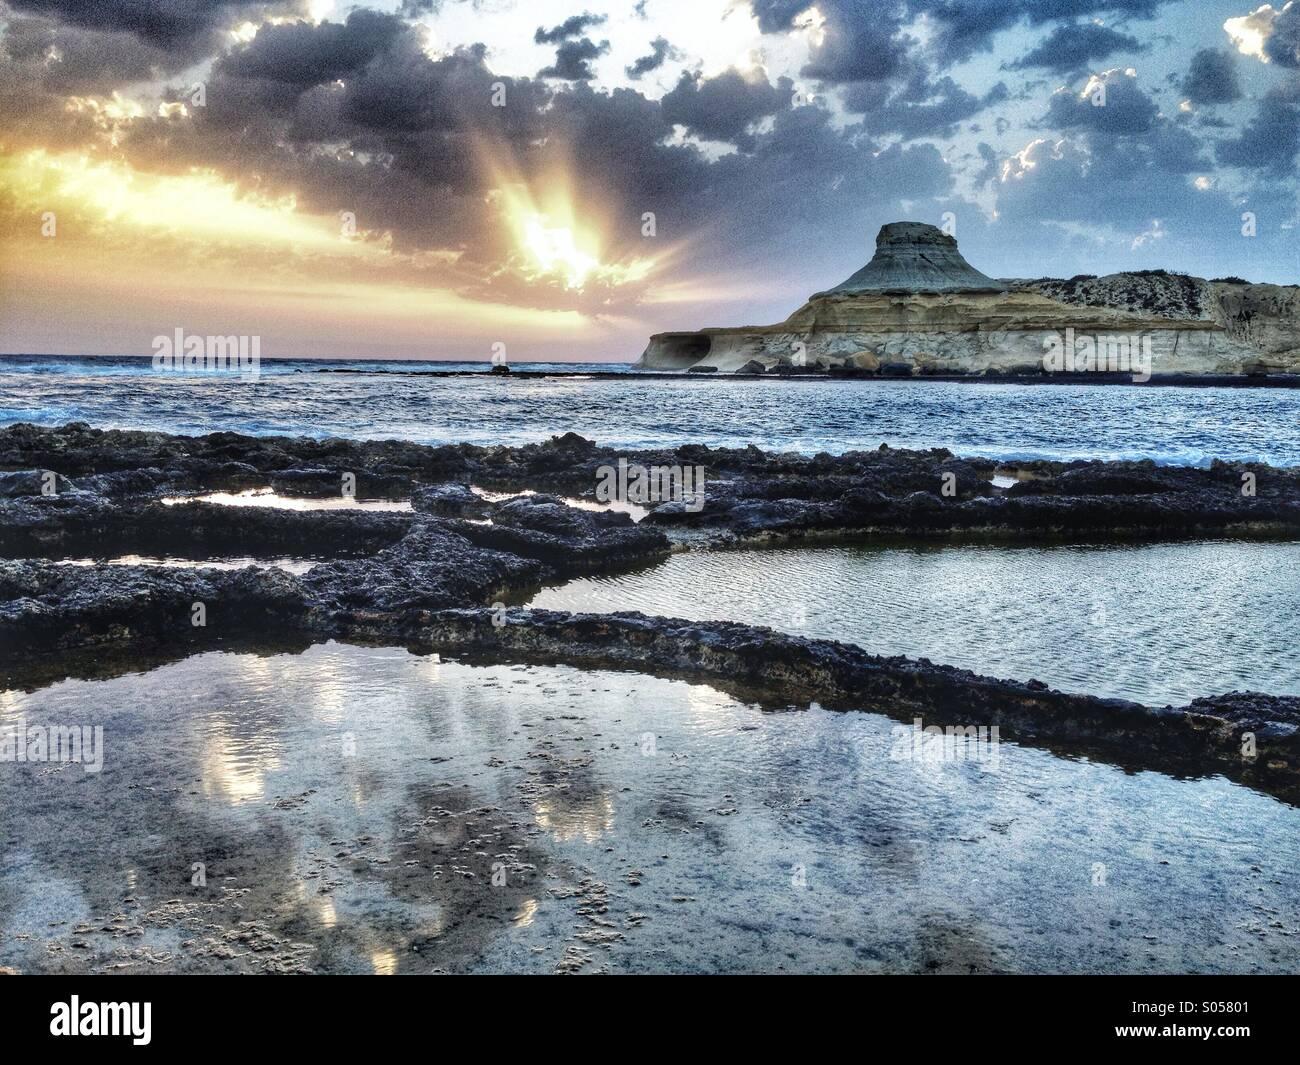 Salt pans at dawn - Stock Image